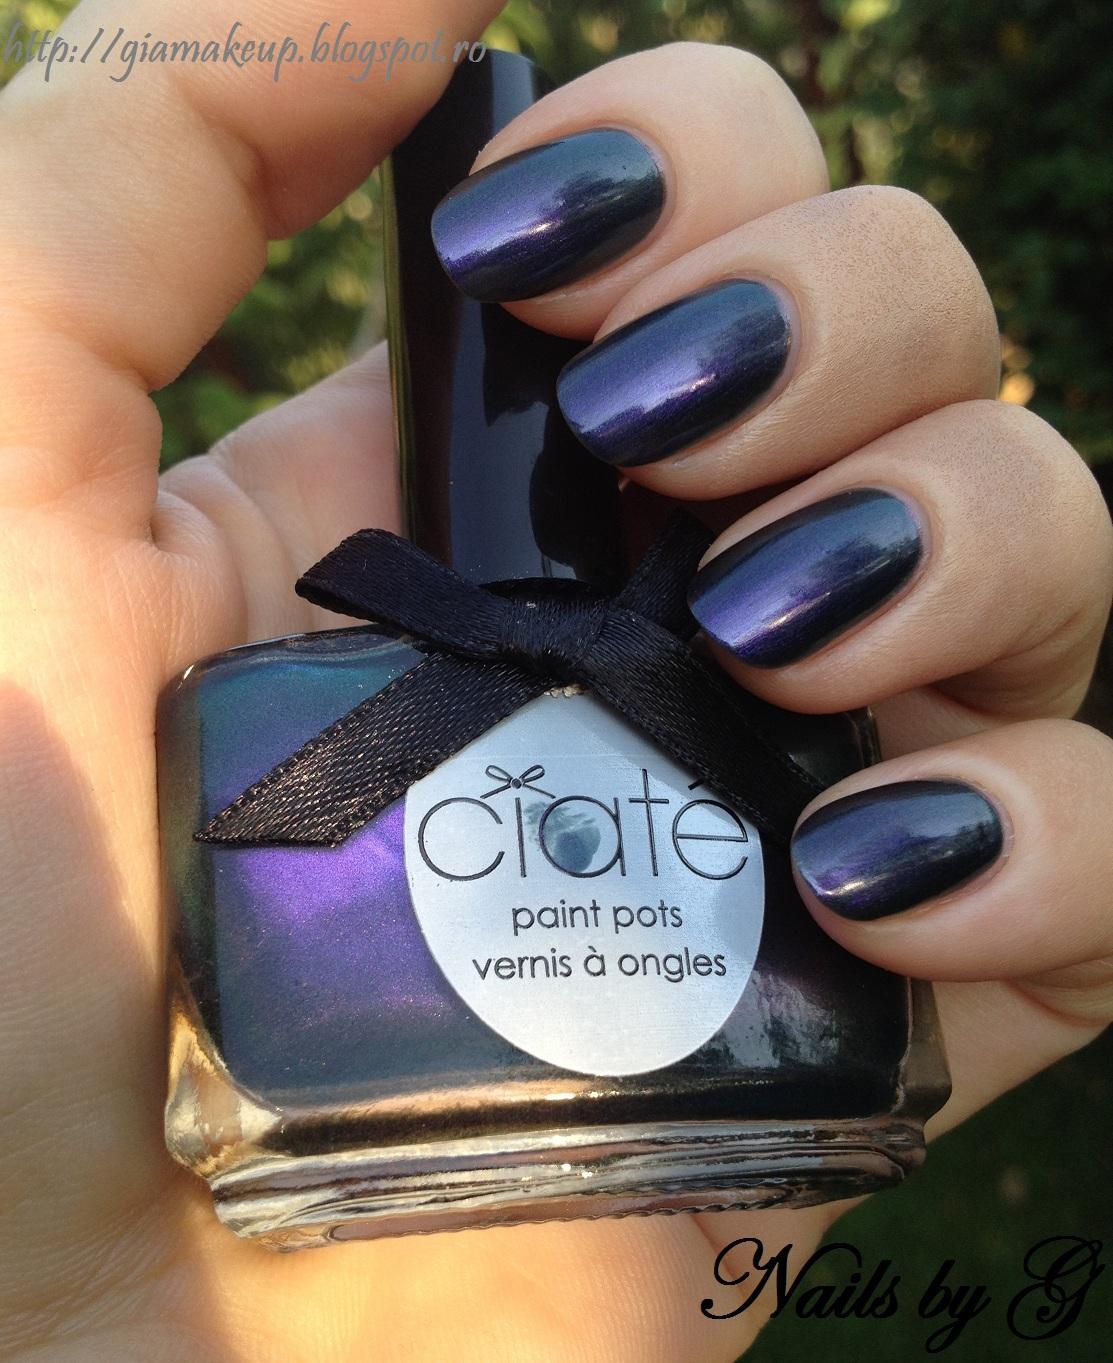 Ciate Starlet: Gia Makeup Blog: Notd: Starlet Chic Reloaded